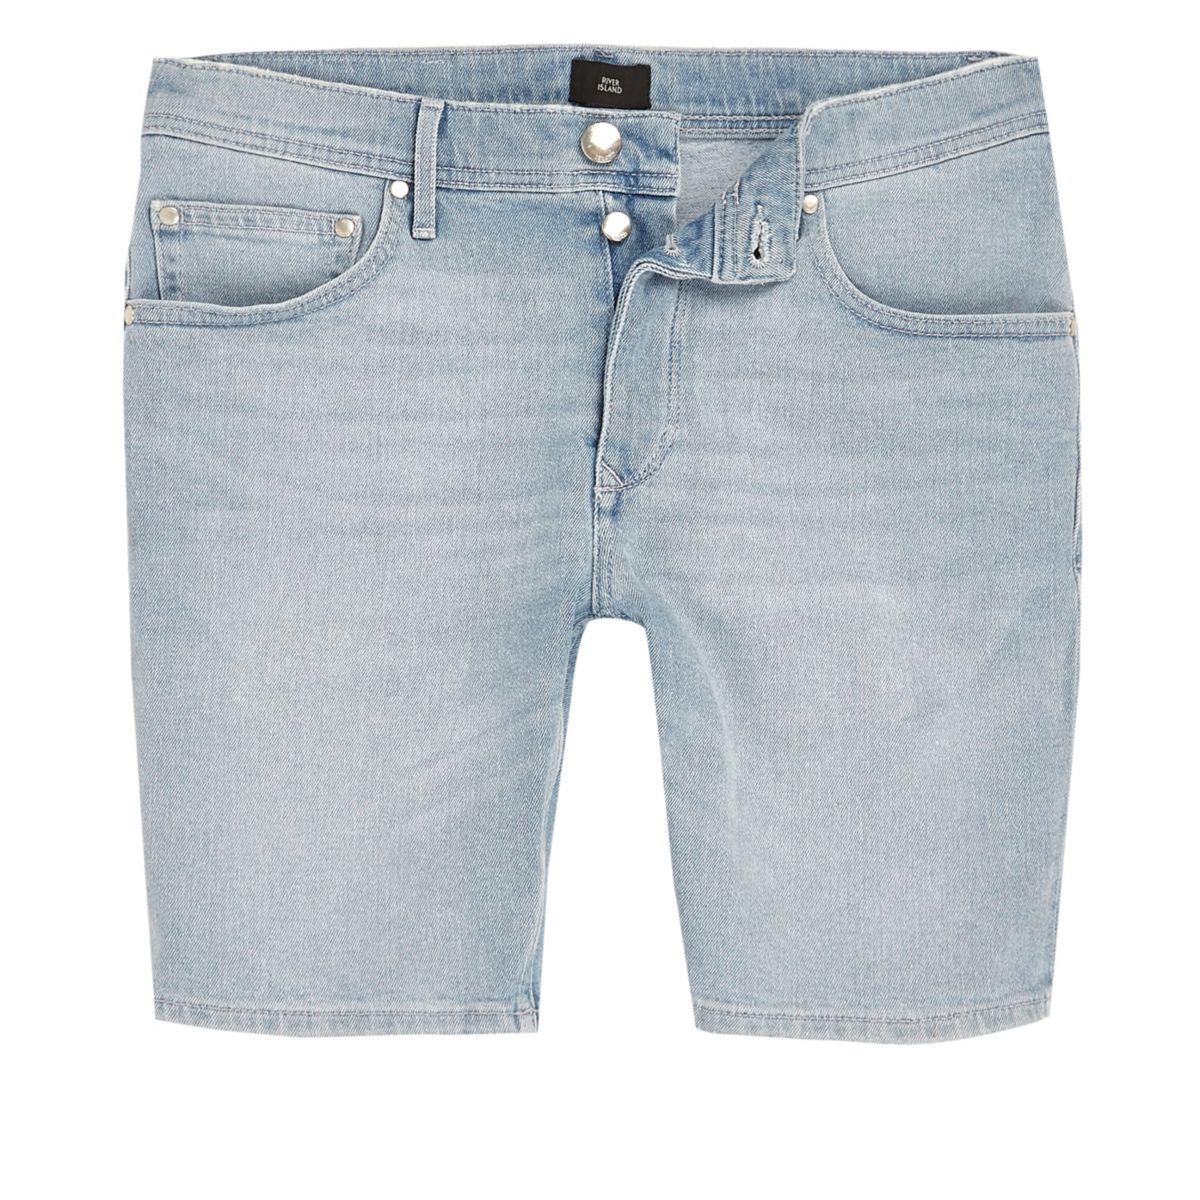 Light blue Sid skinny fit denim shorts